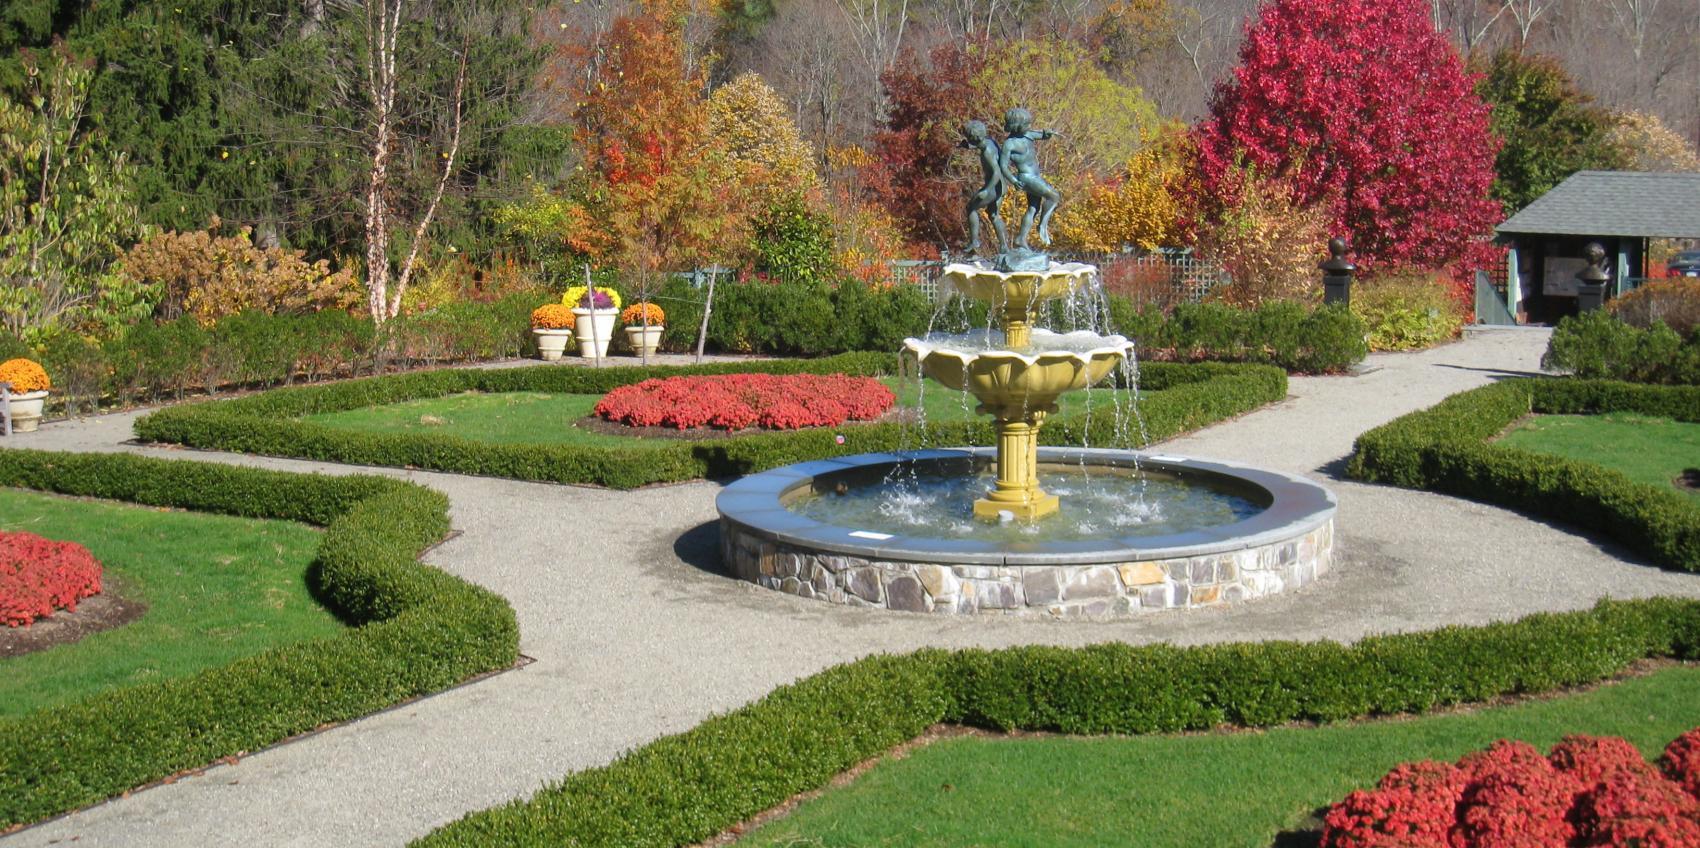 Lasdon Park And Arboretum American Public Gardens Association